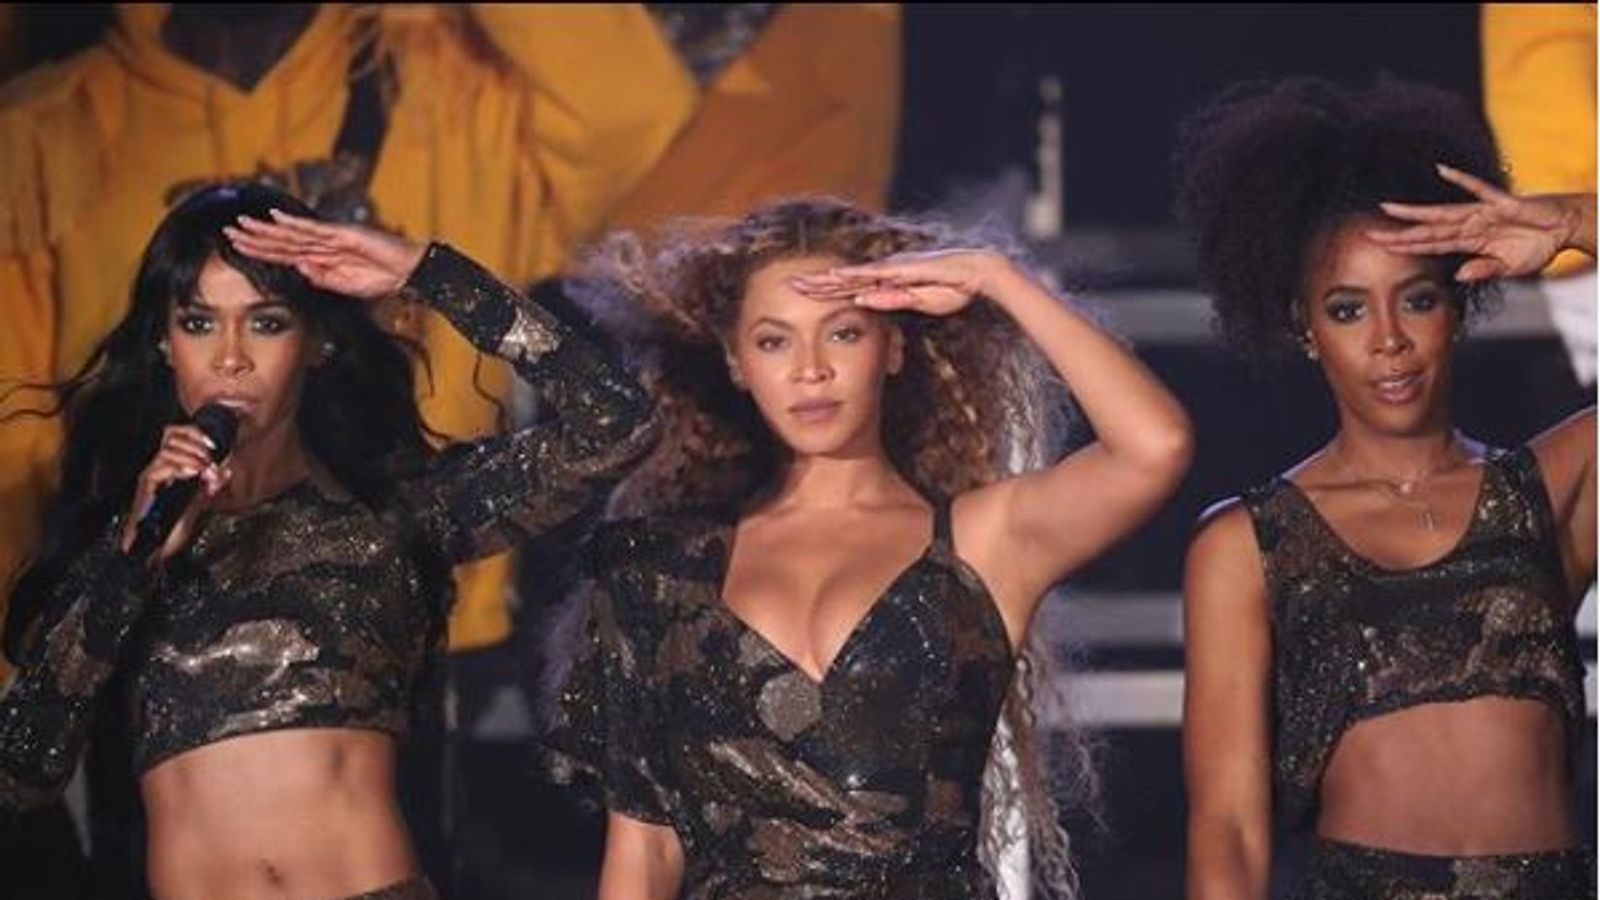 Best Surprise Ever: Destiny's Child Reuniting for NewAlbum